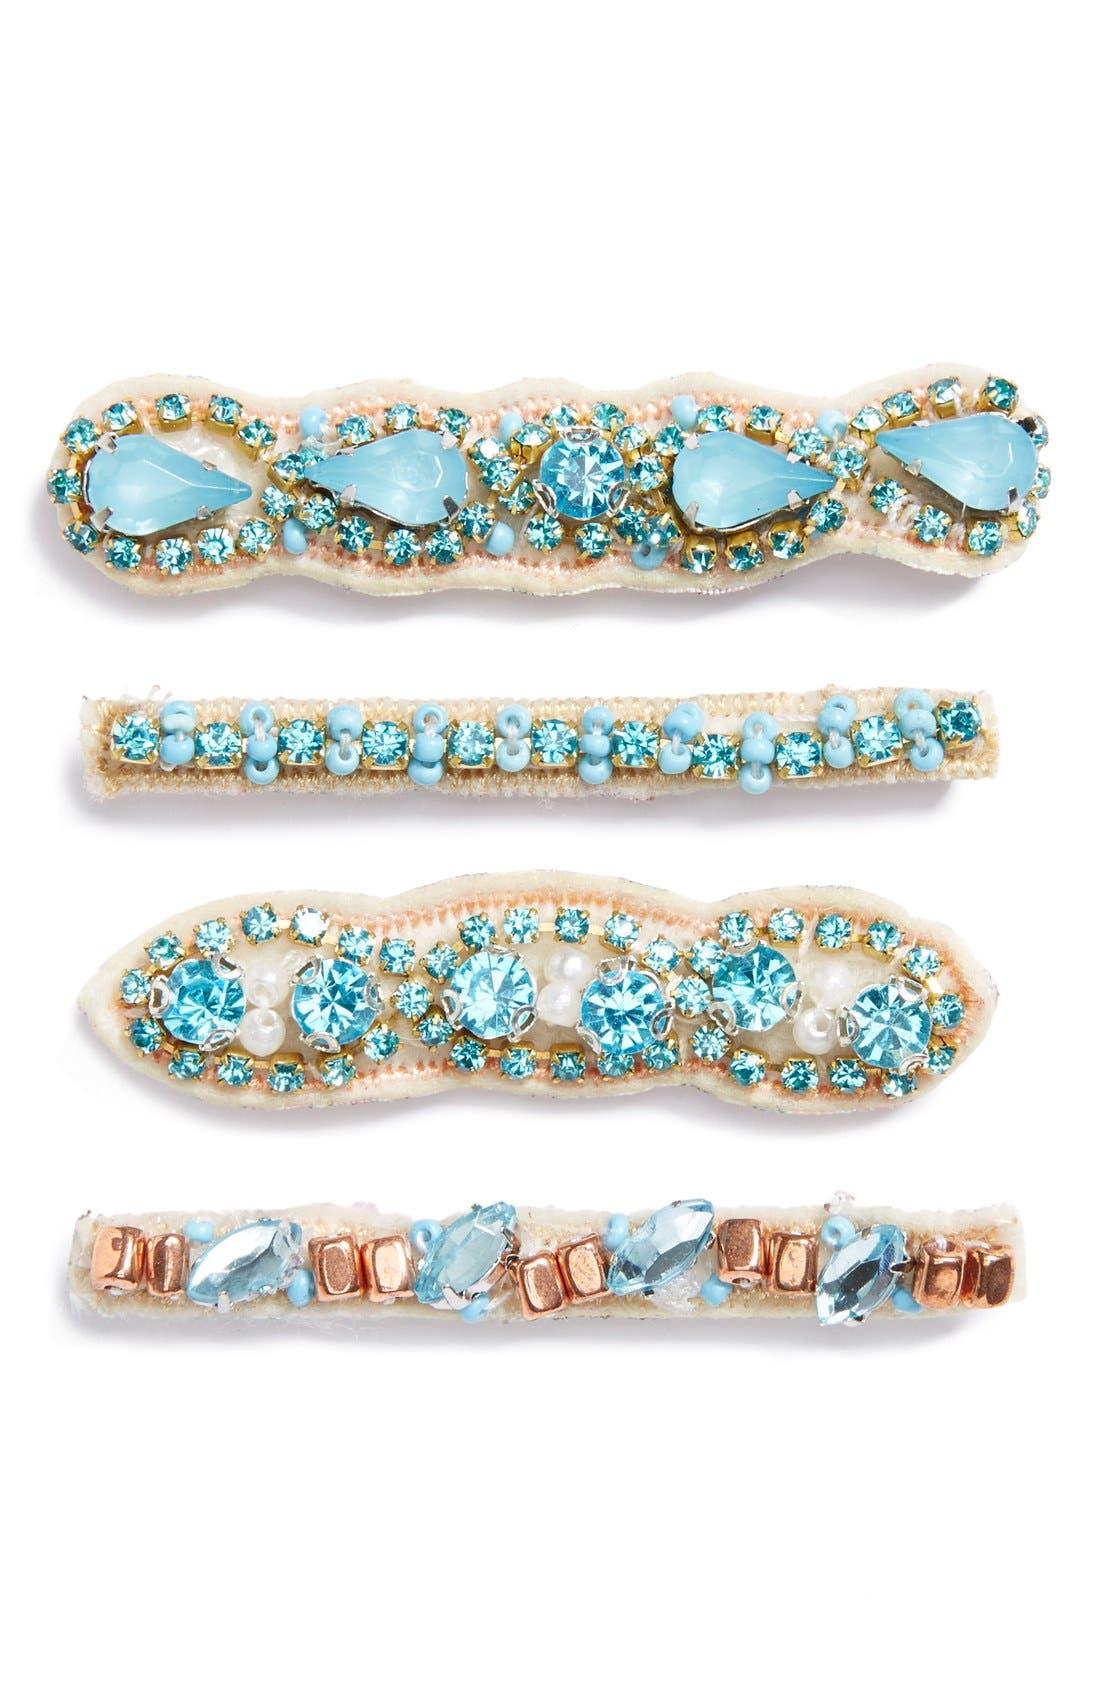 Alternate Image 1 Selected - Tasha Jeweled Bobby Pins (4-Pack)